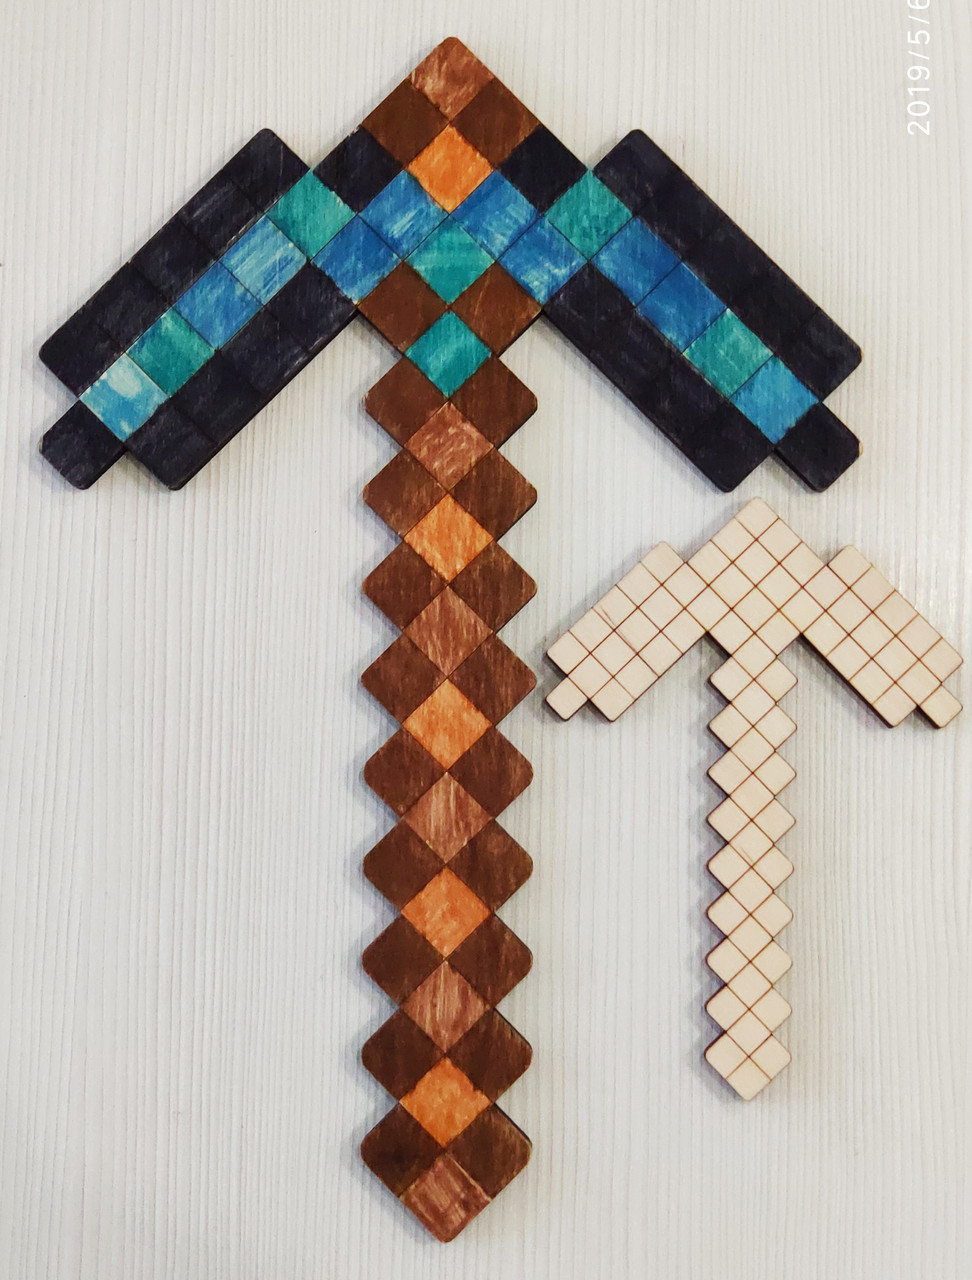 Міні кирка - розмальовка Minecraft (мини кирка - раскраска ...